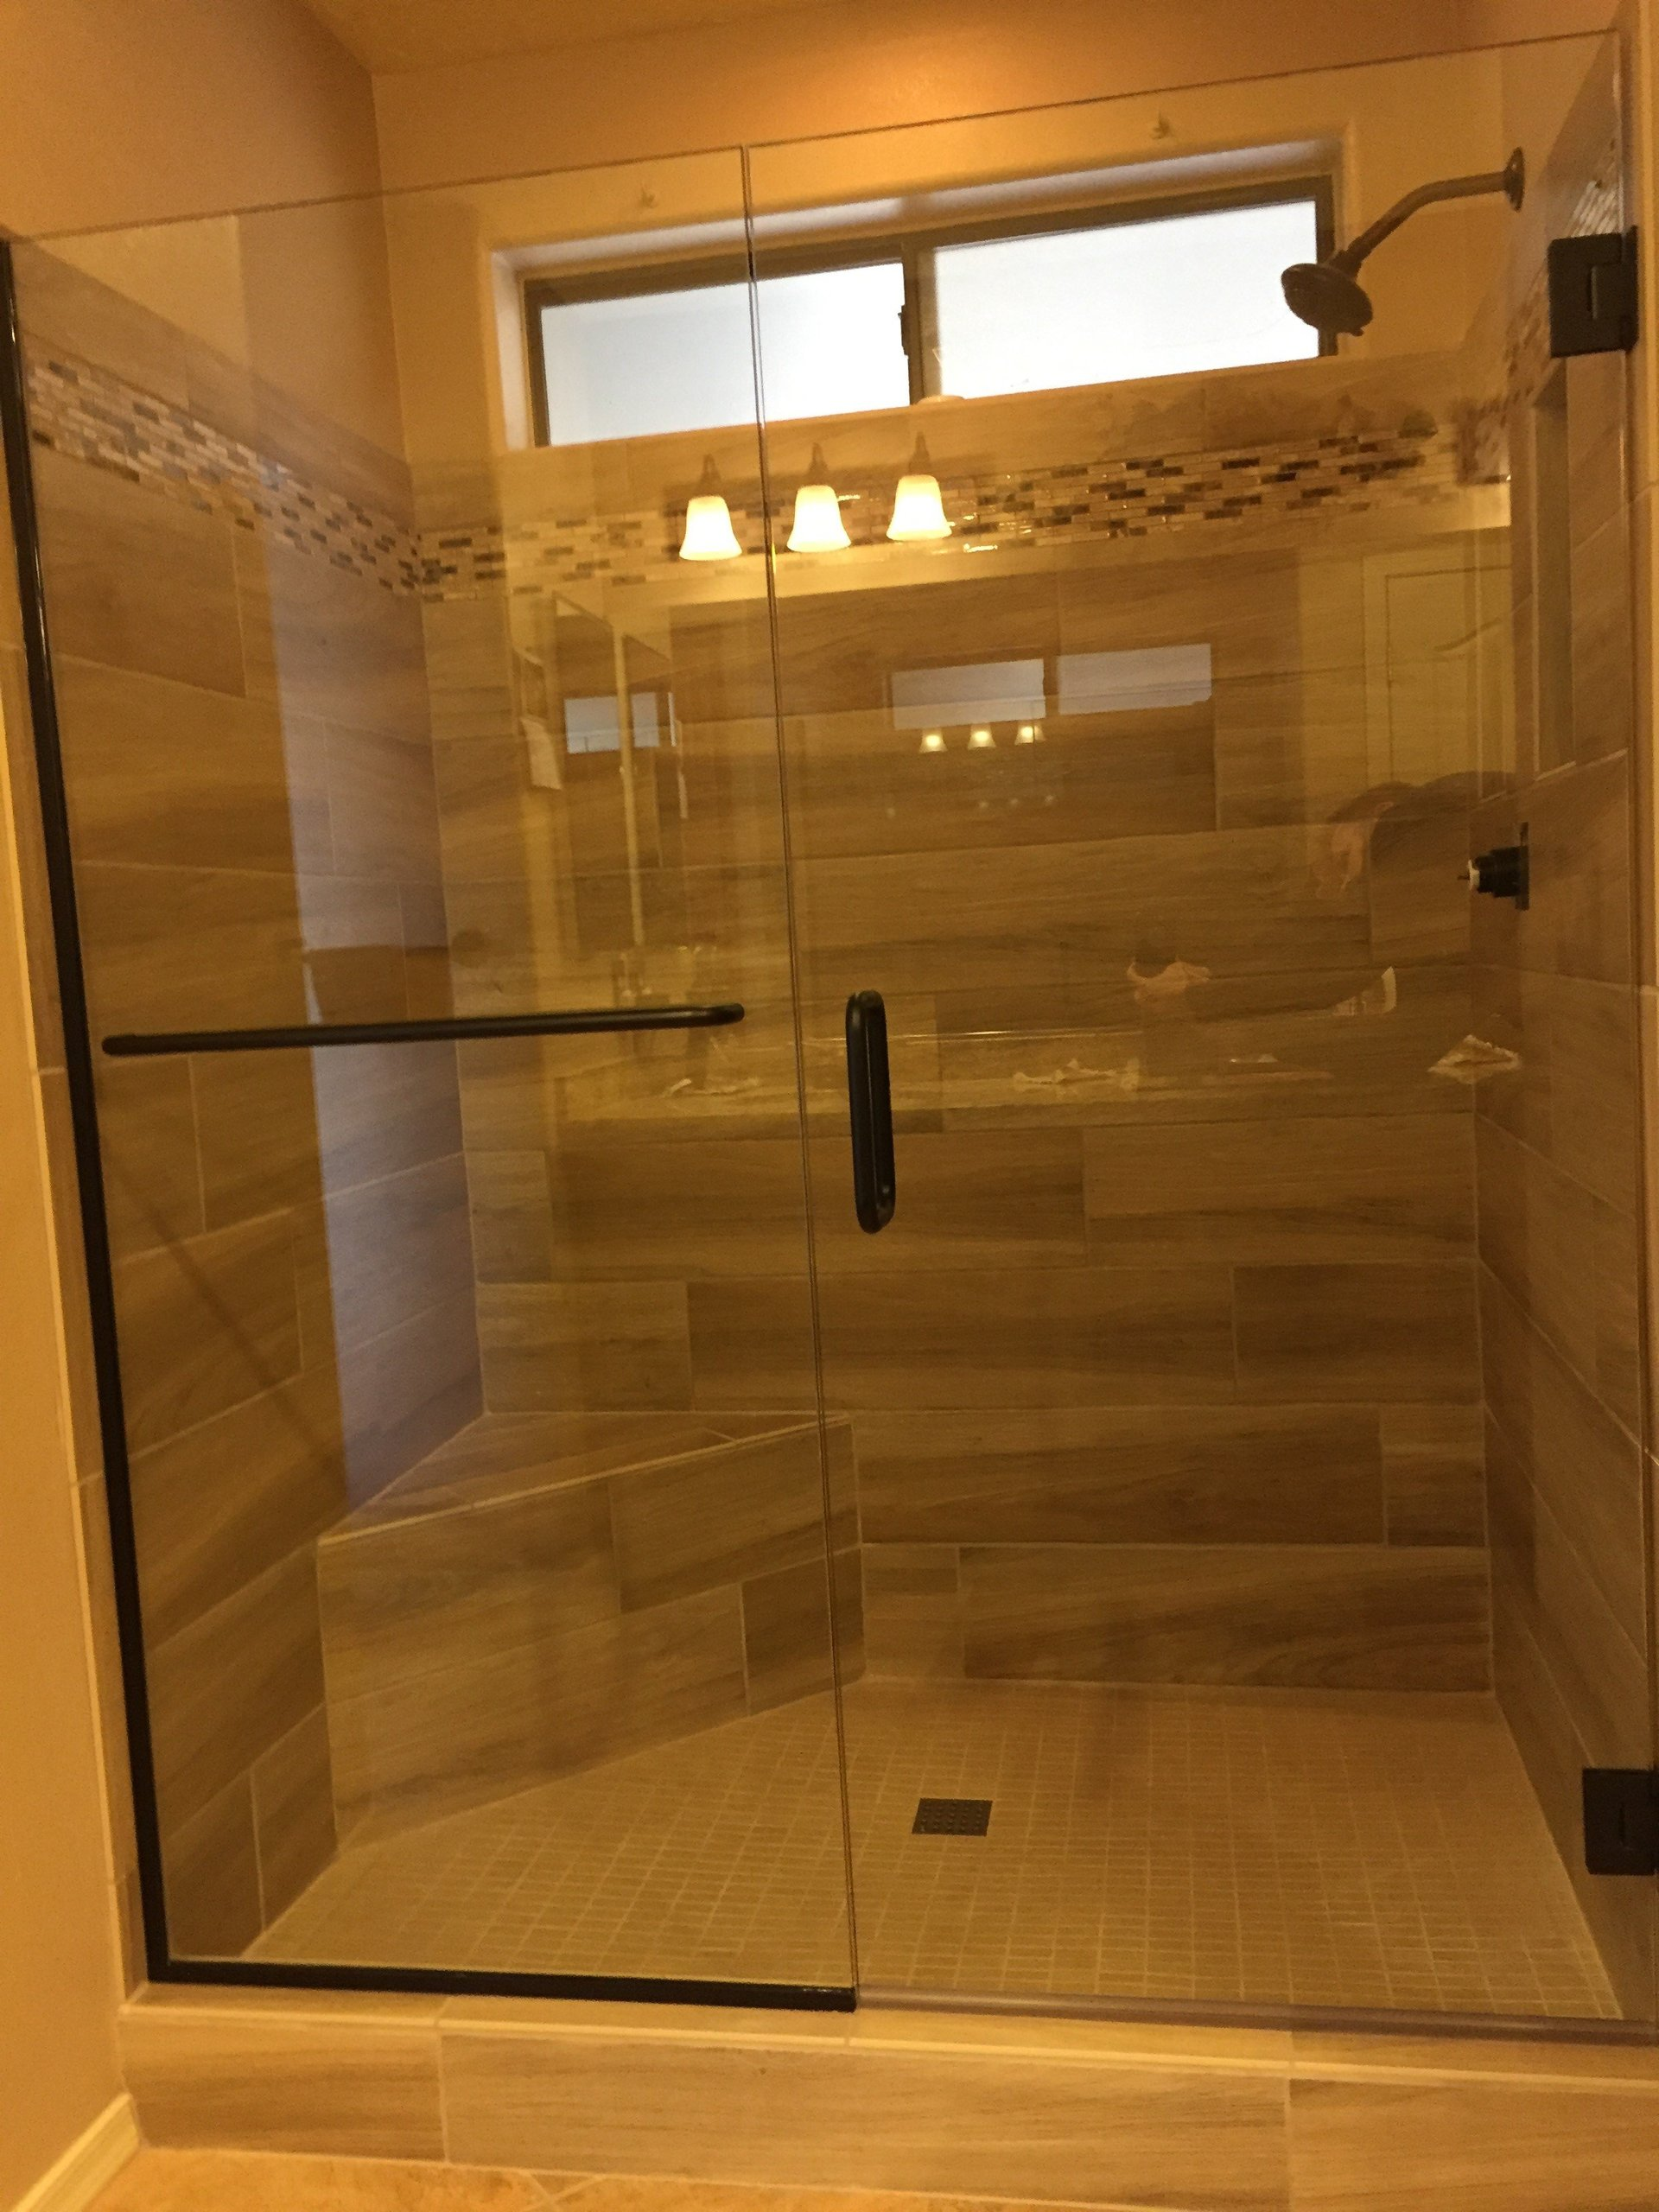 Residential Window Glass Prescott Valley Amp Prescott Az